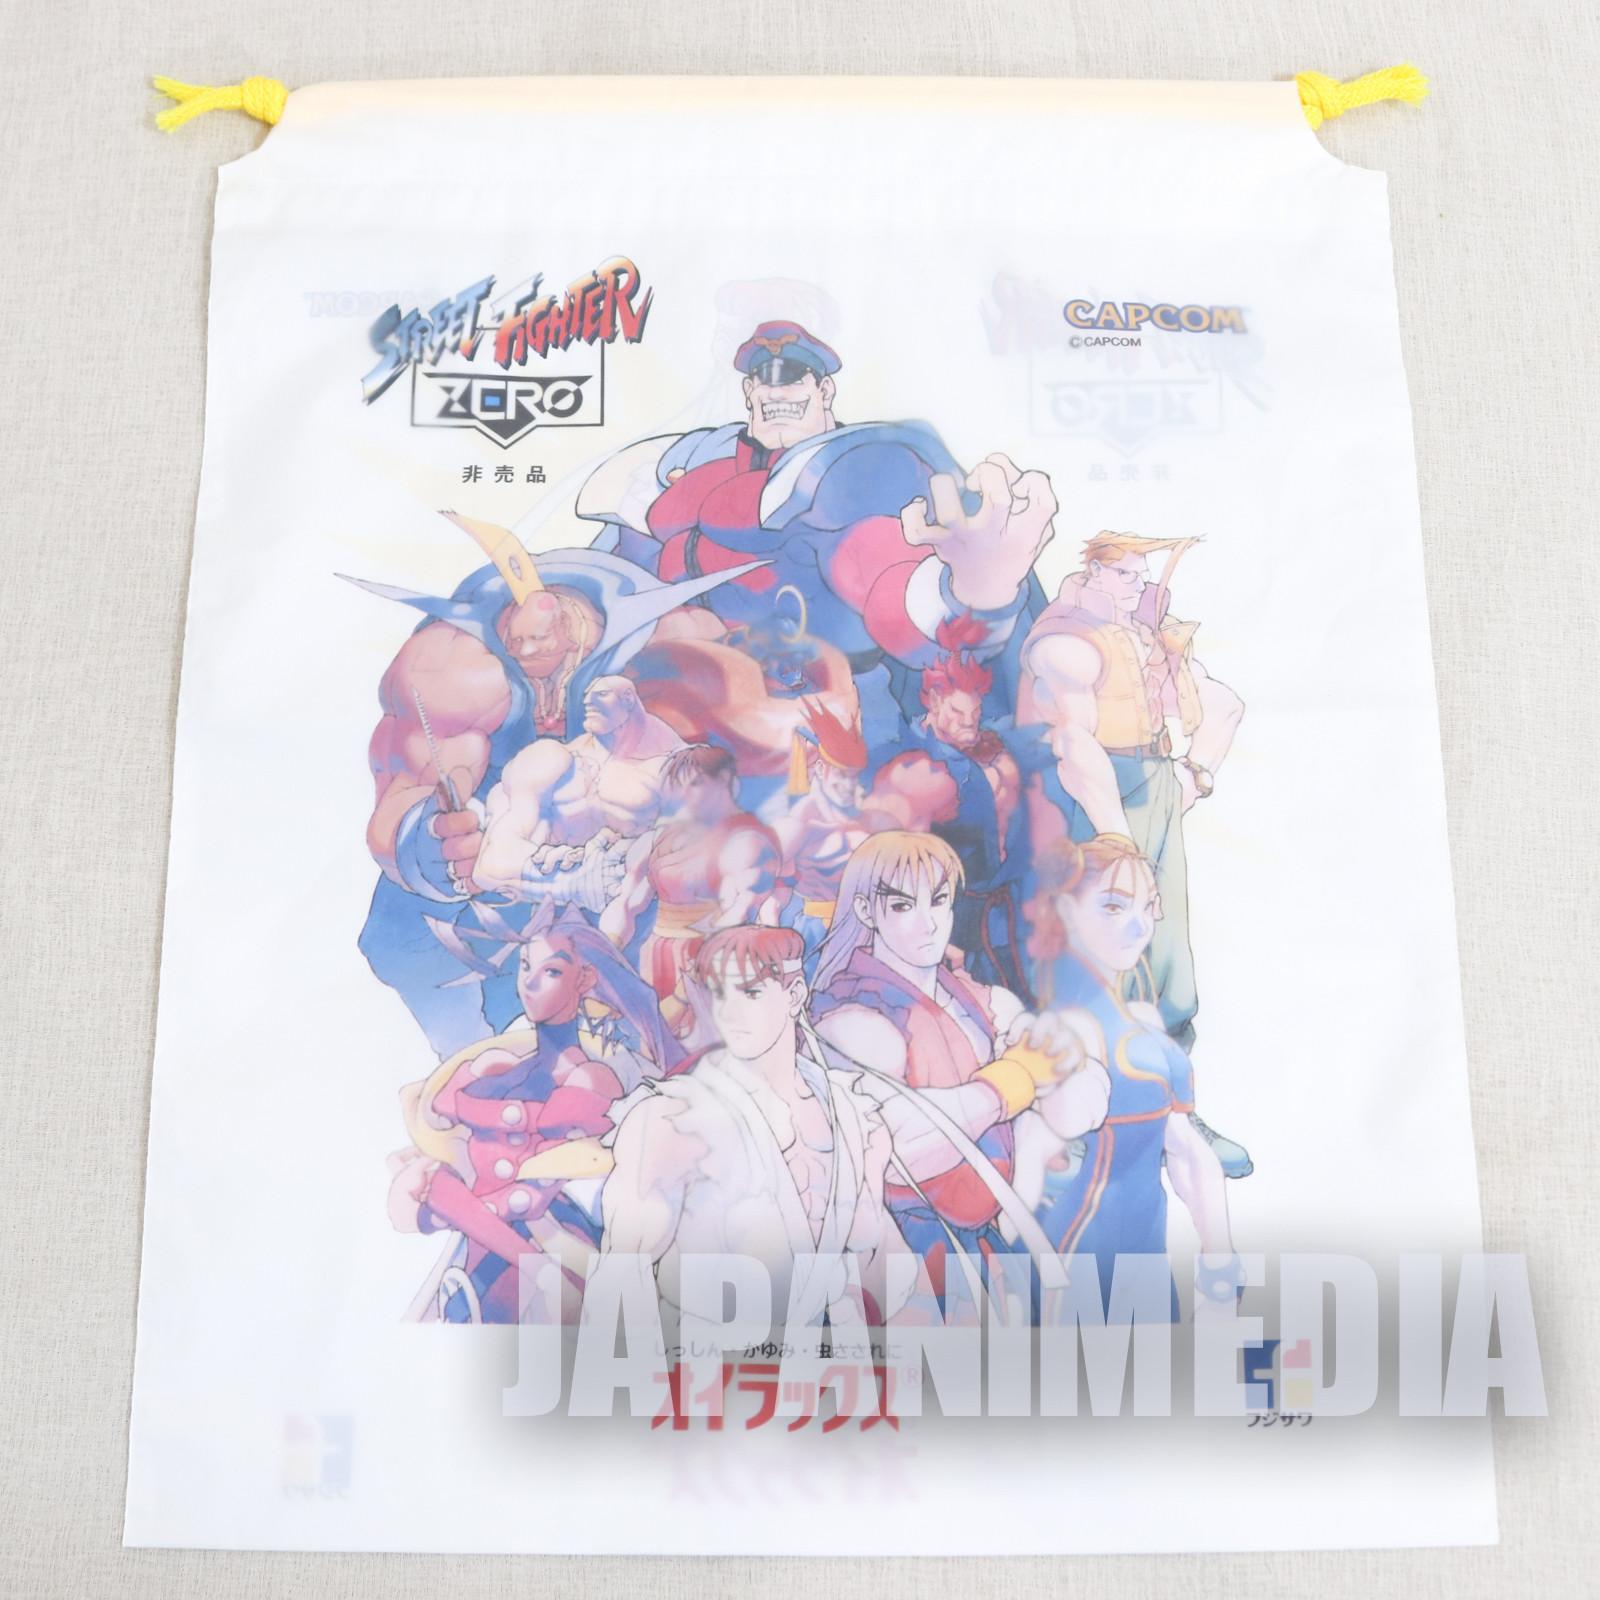 Street Fighter Zero Promotion Vinyl Drawstring Bag #1 JAPAN GAME ALPHA